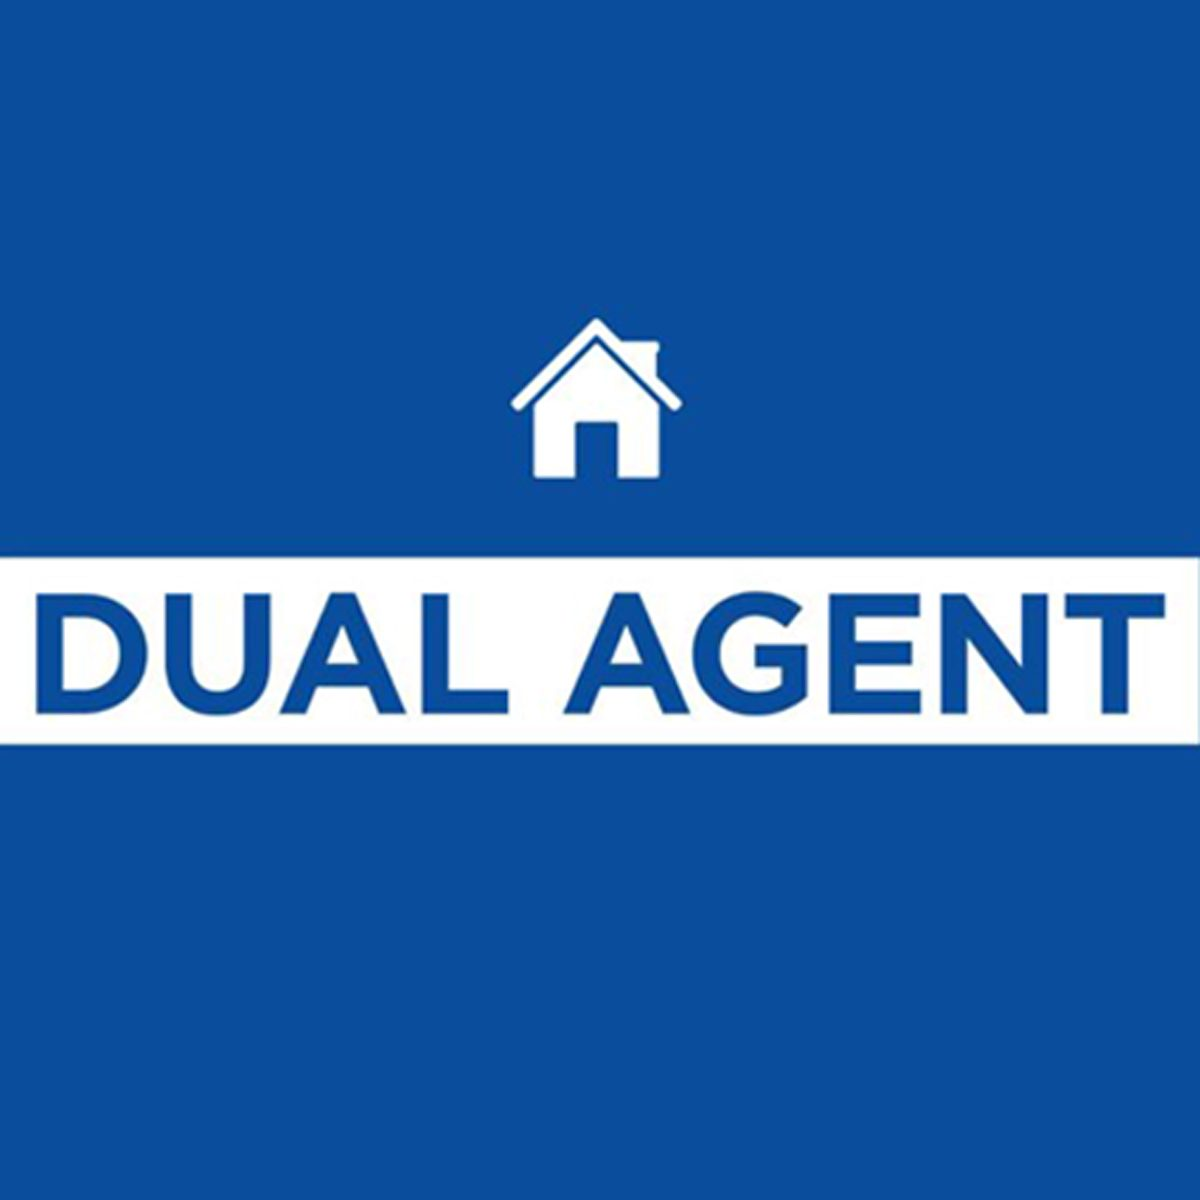 dual agent